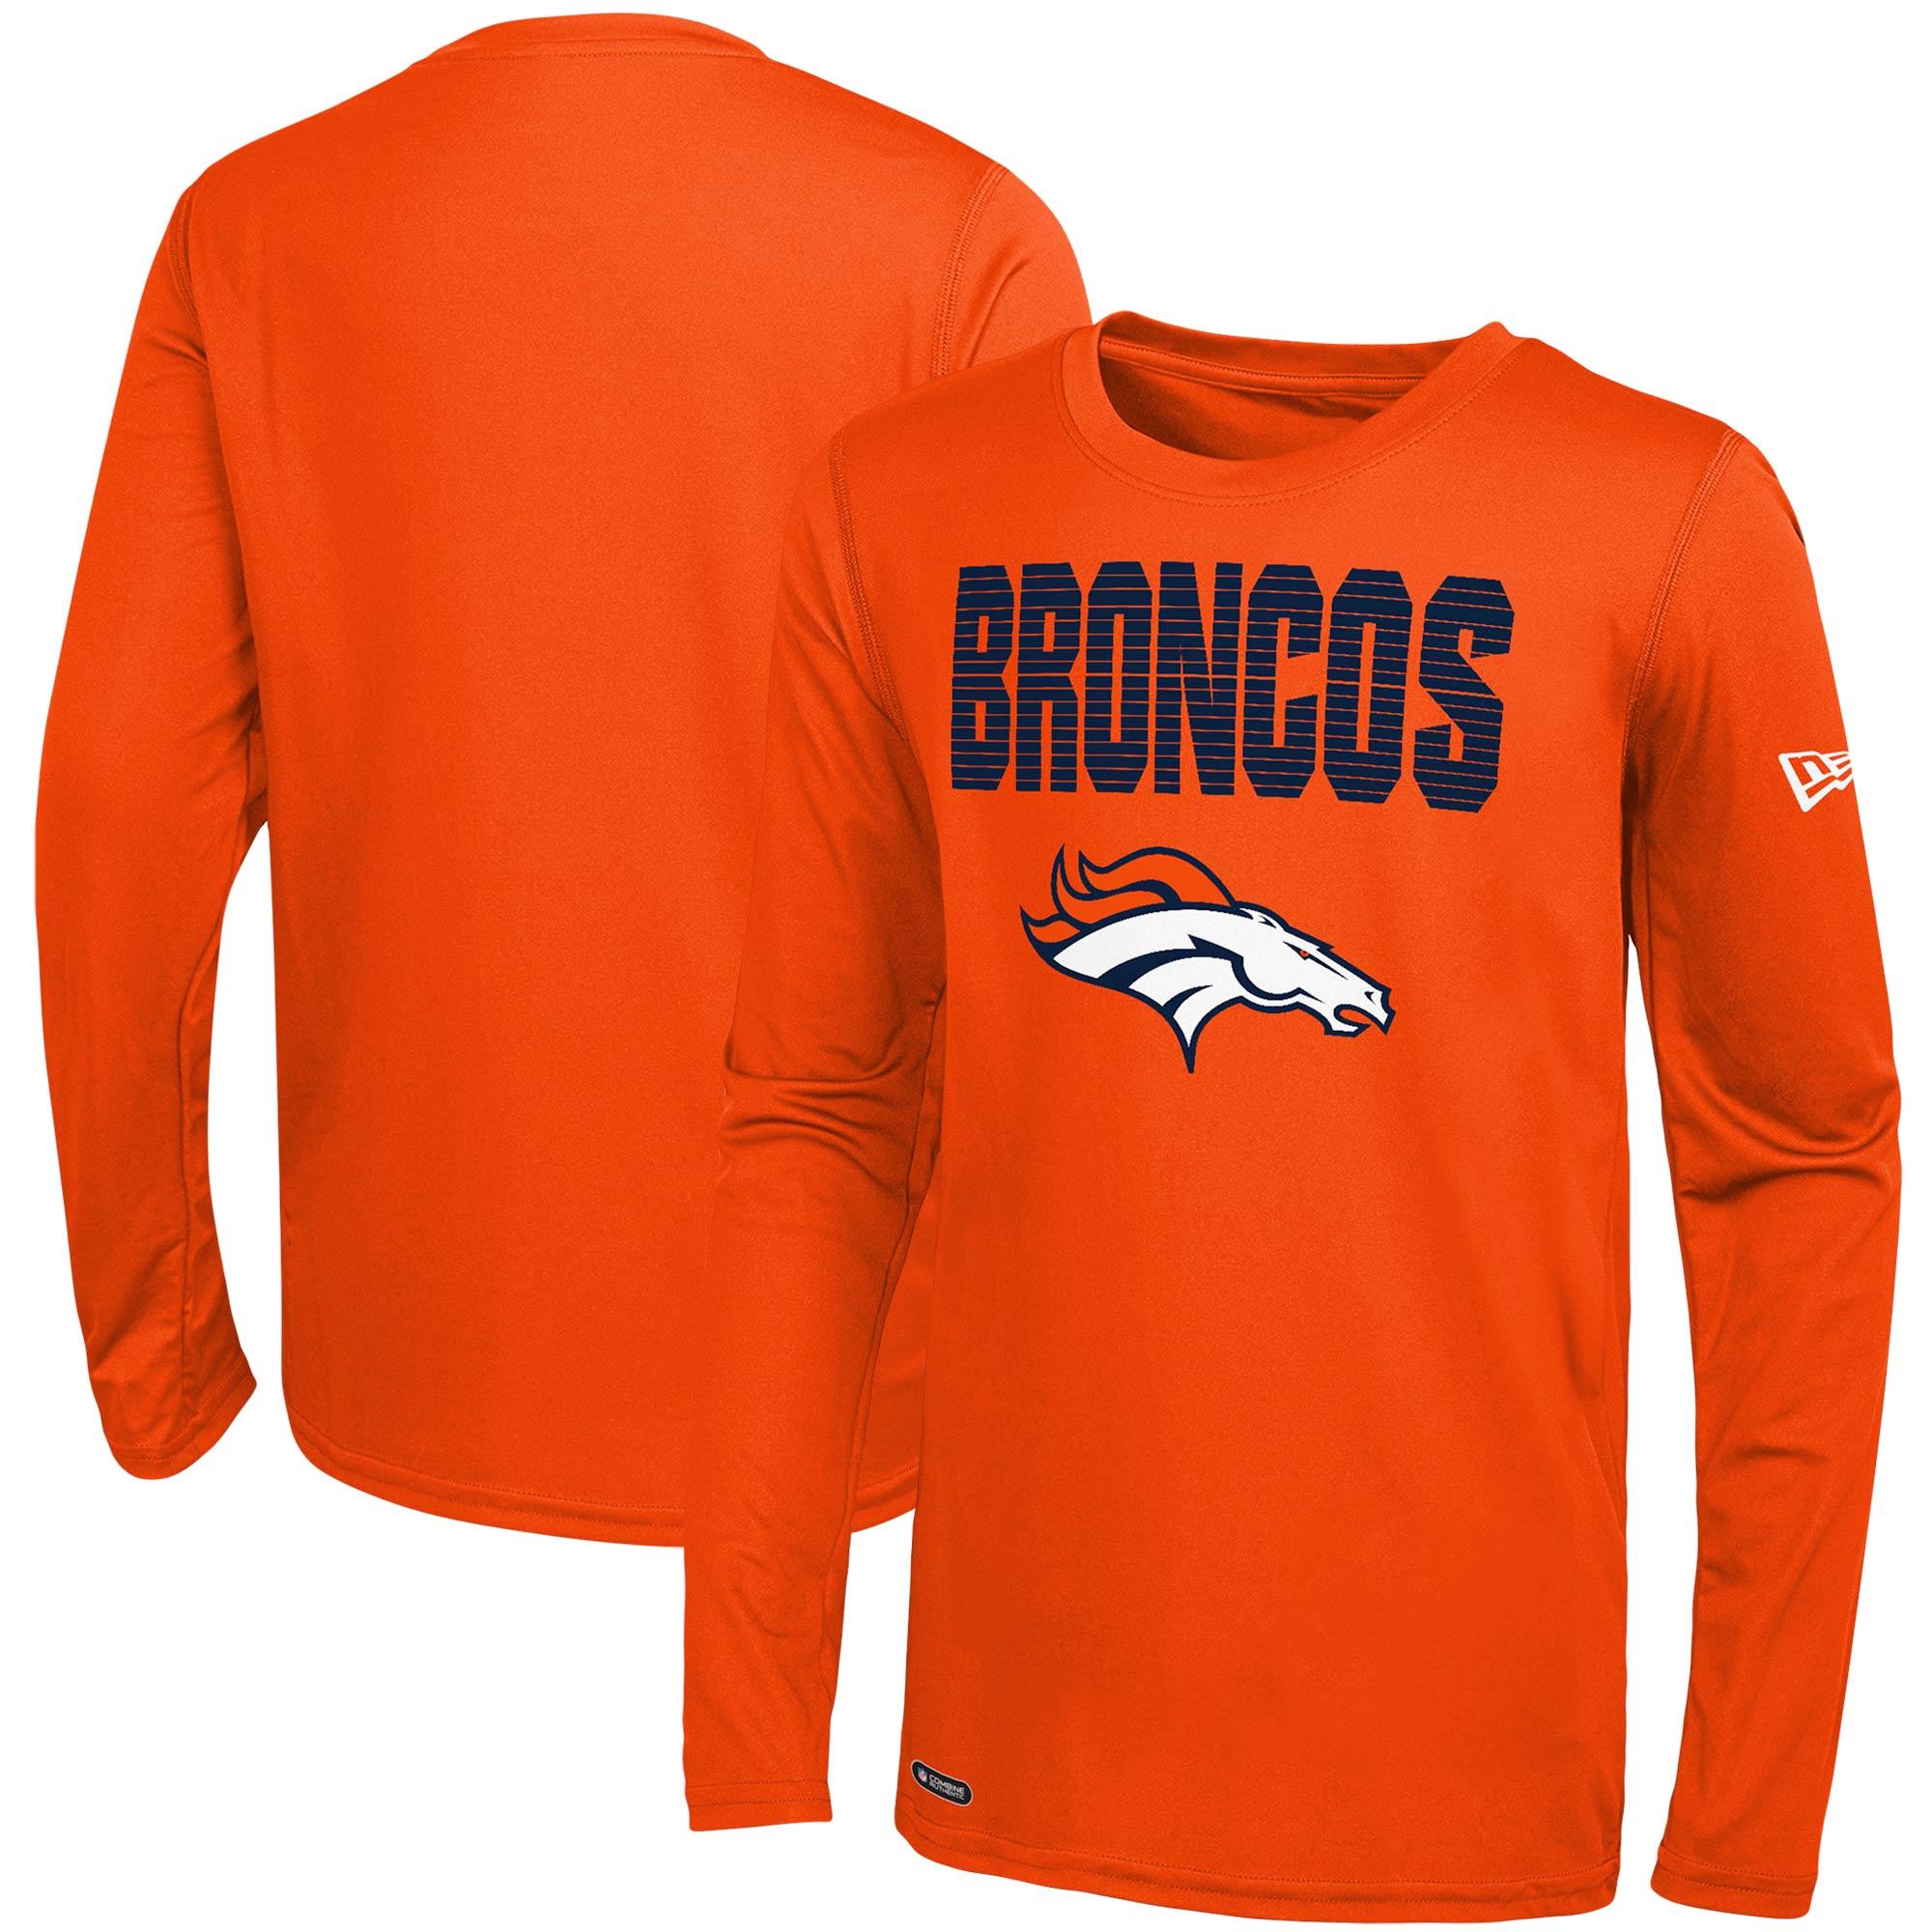 Denver Broncos New Era Combine 50 Yard Line Long Sleeve T-Shirt - Orange